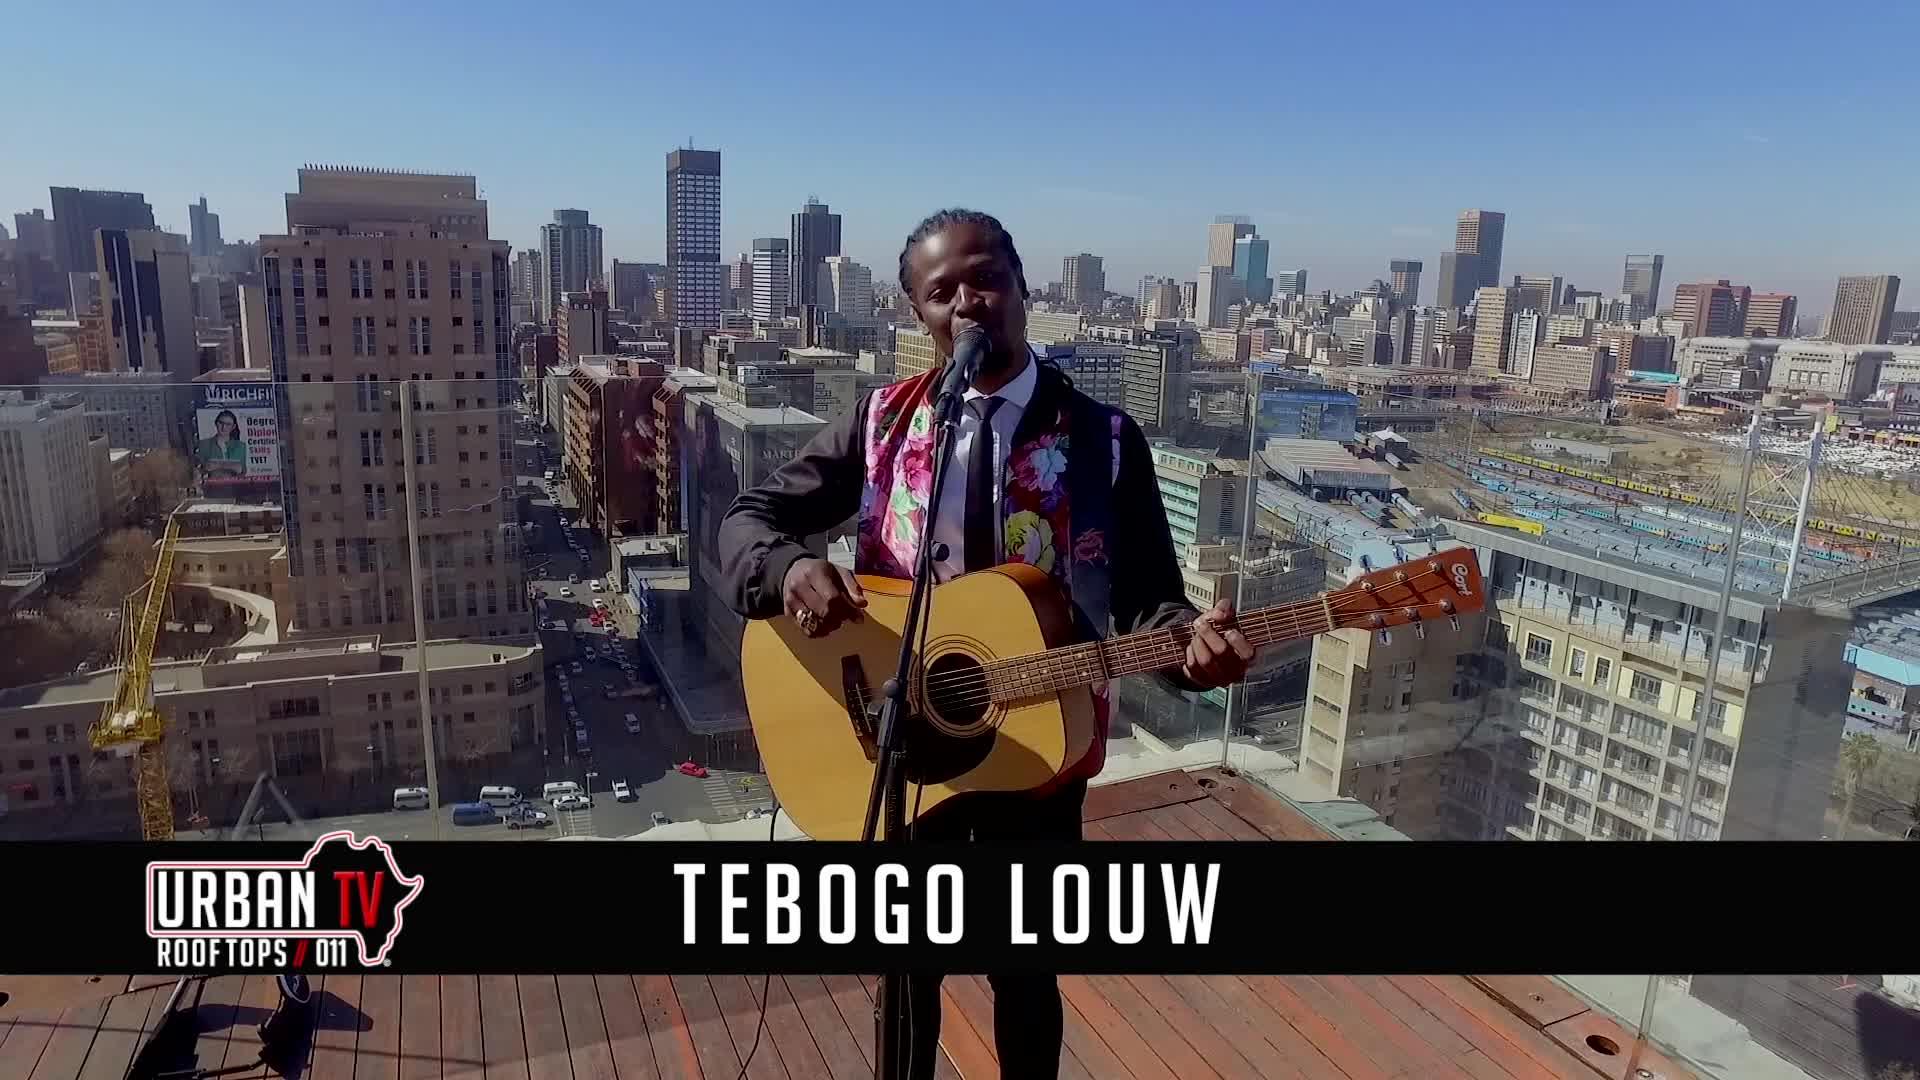 Urban Rooftops 011 - Tebogo